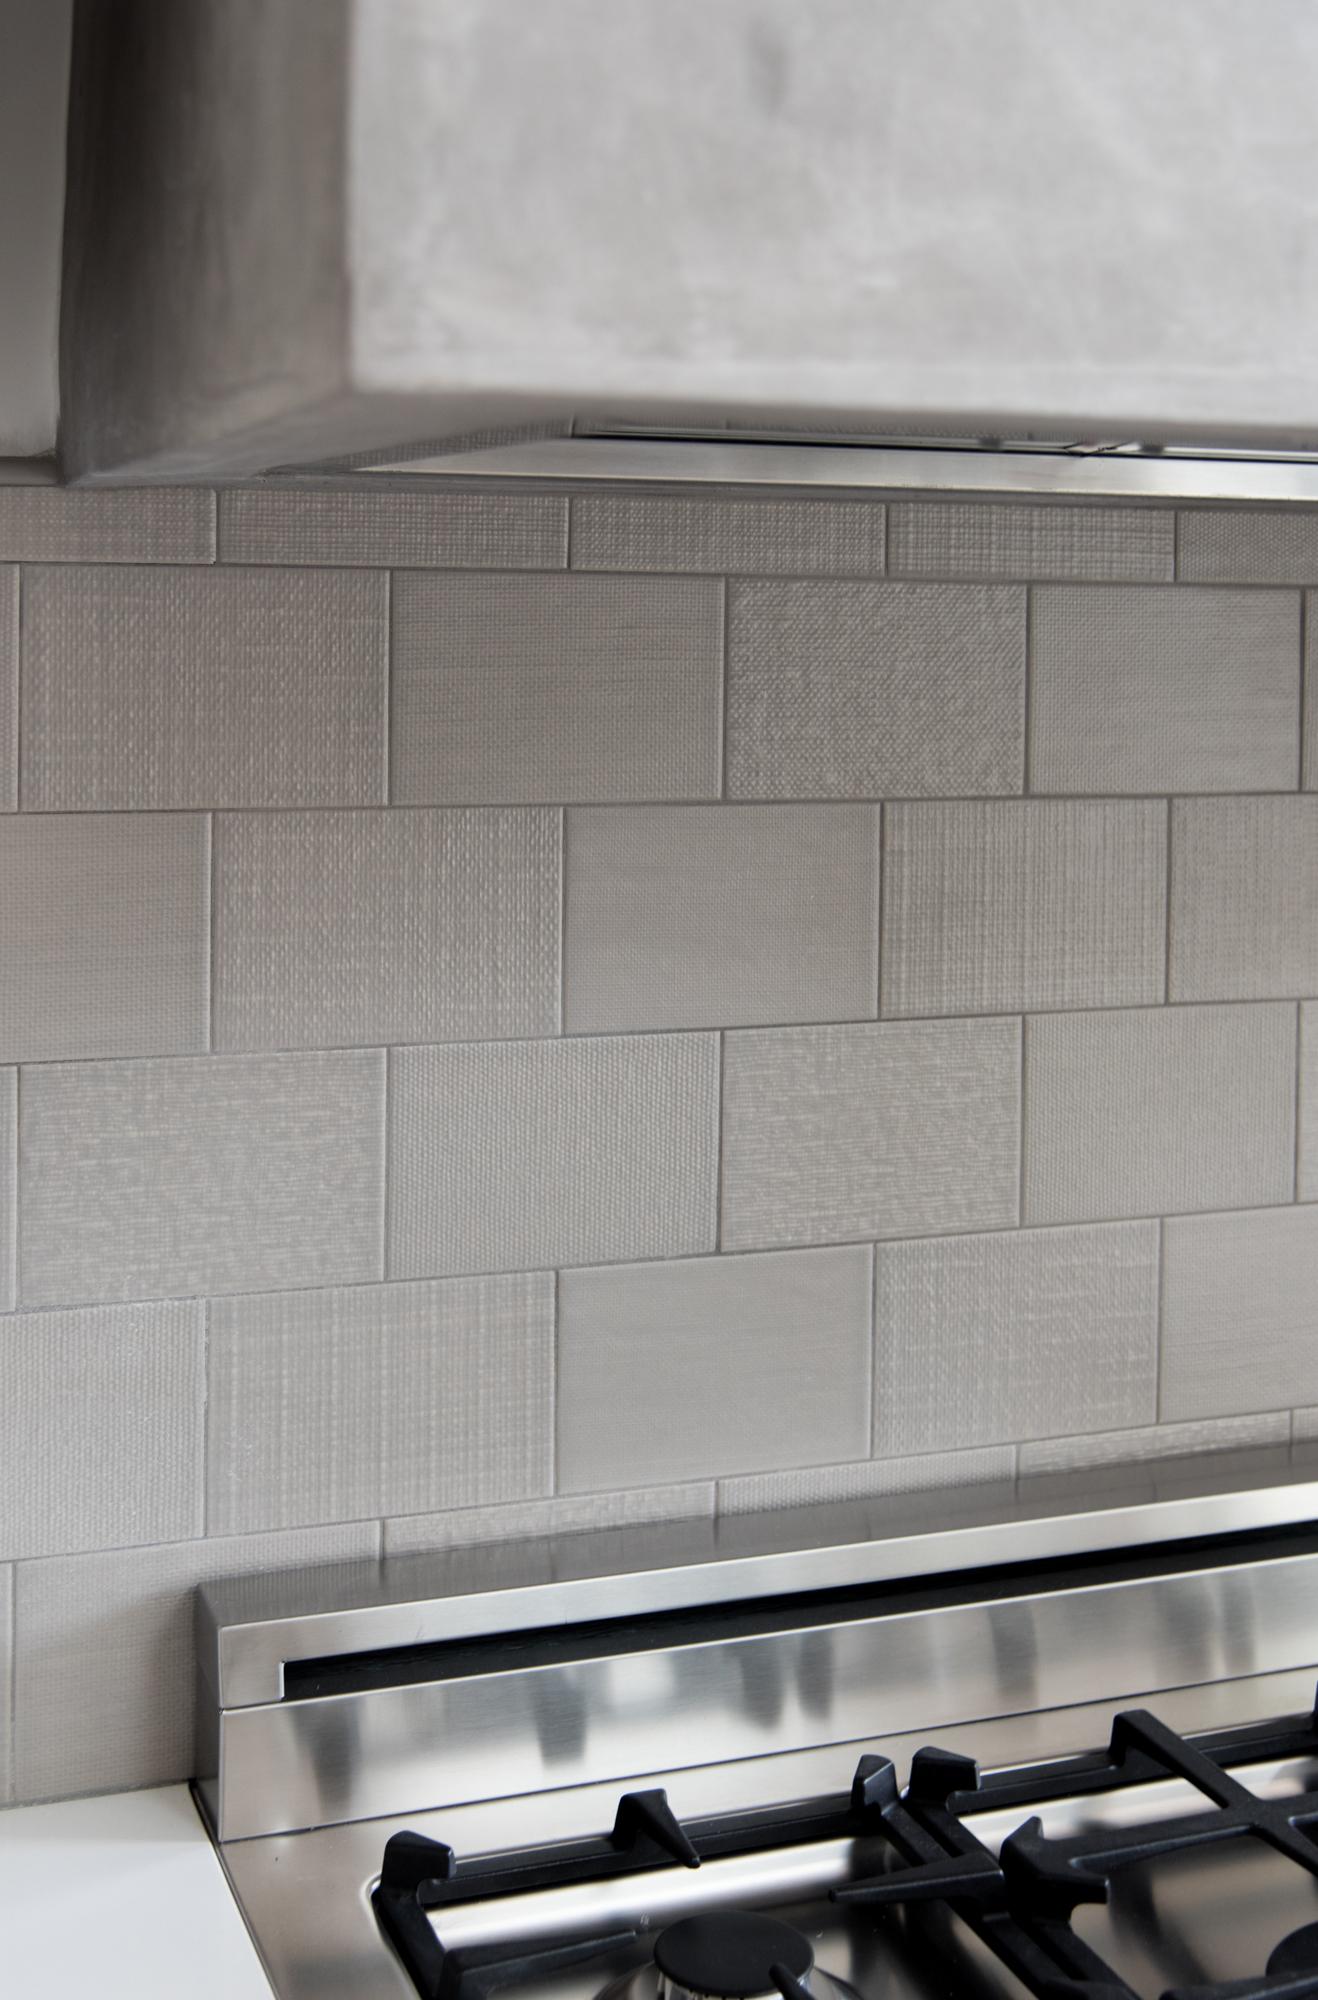 Imola Kiko Italian Ceramic Wall Tile